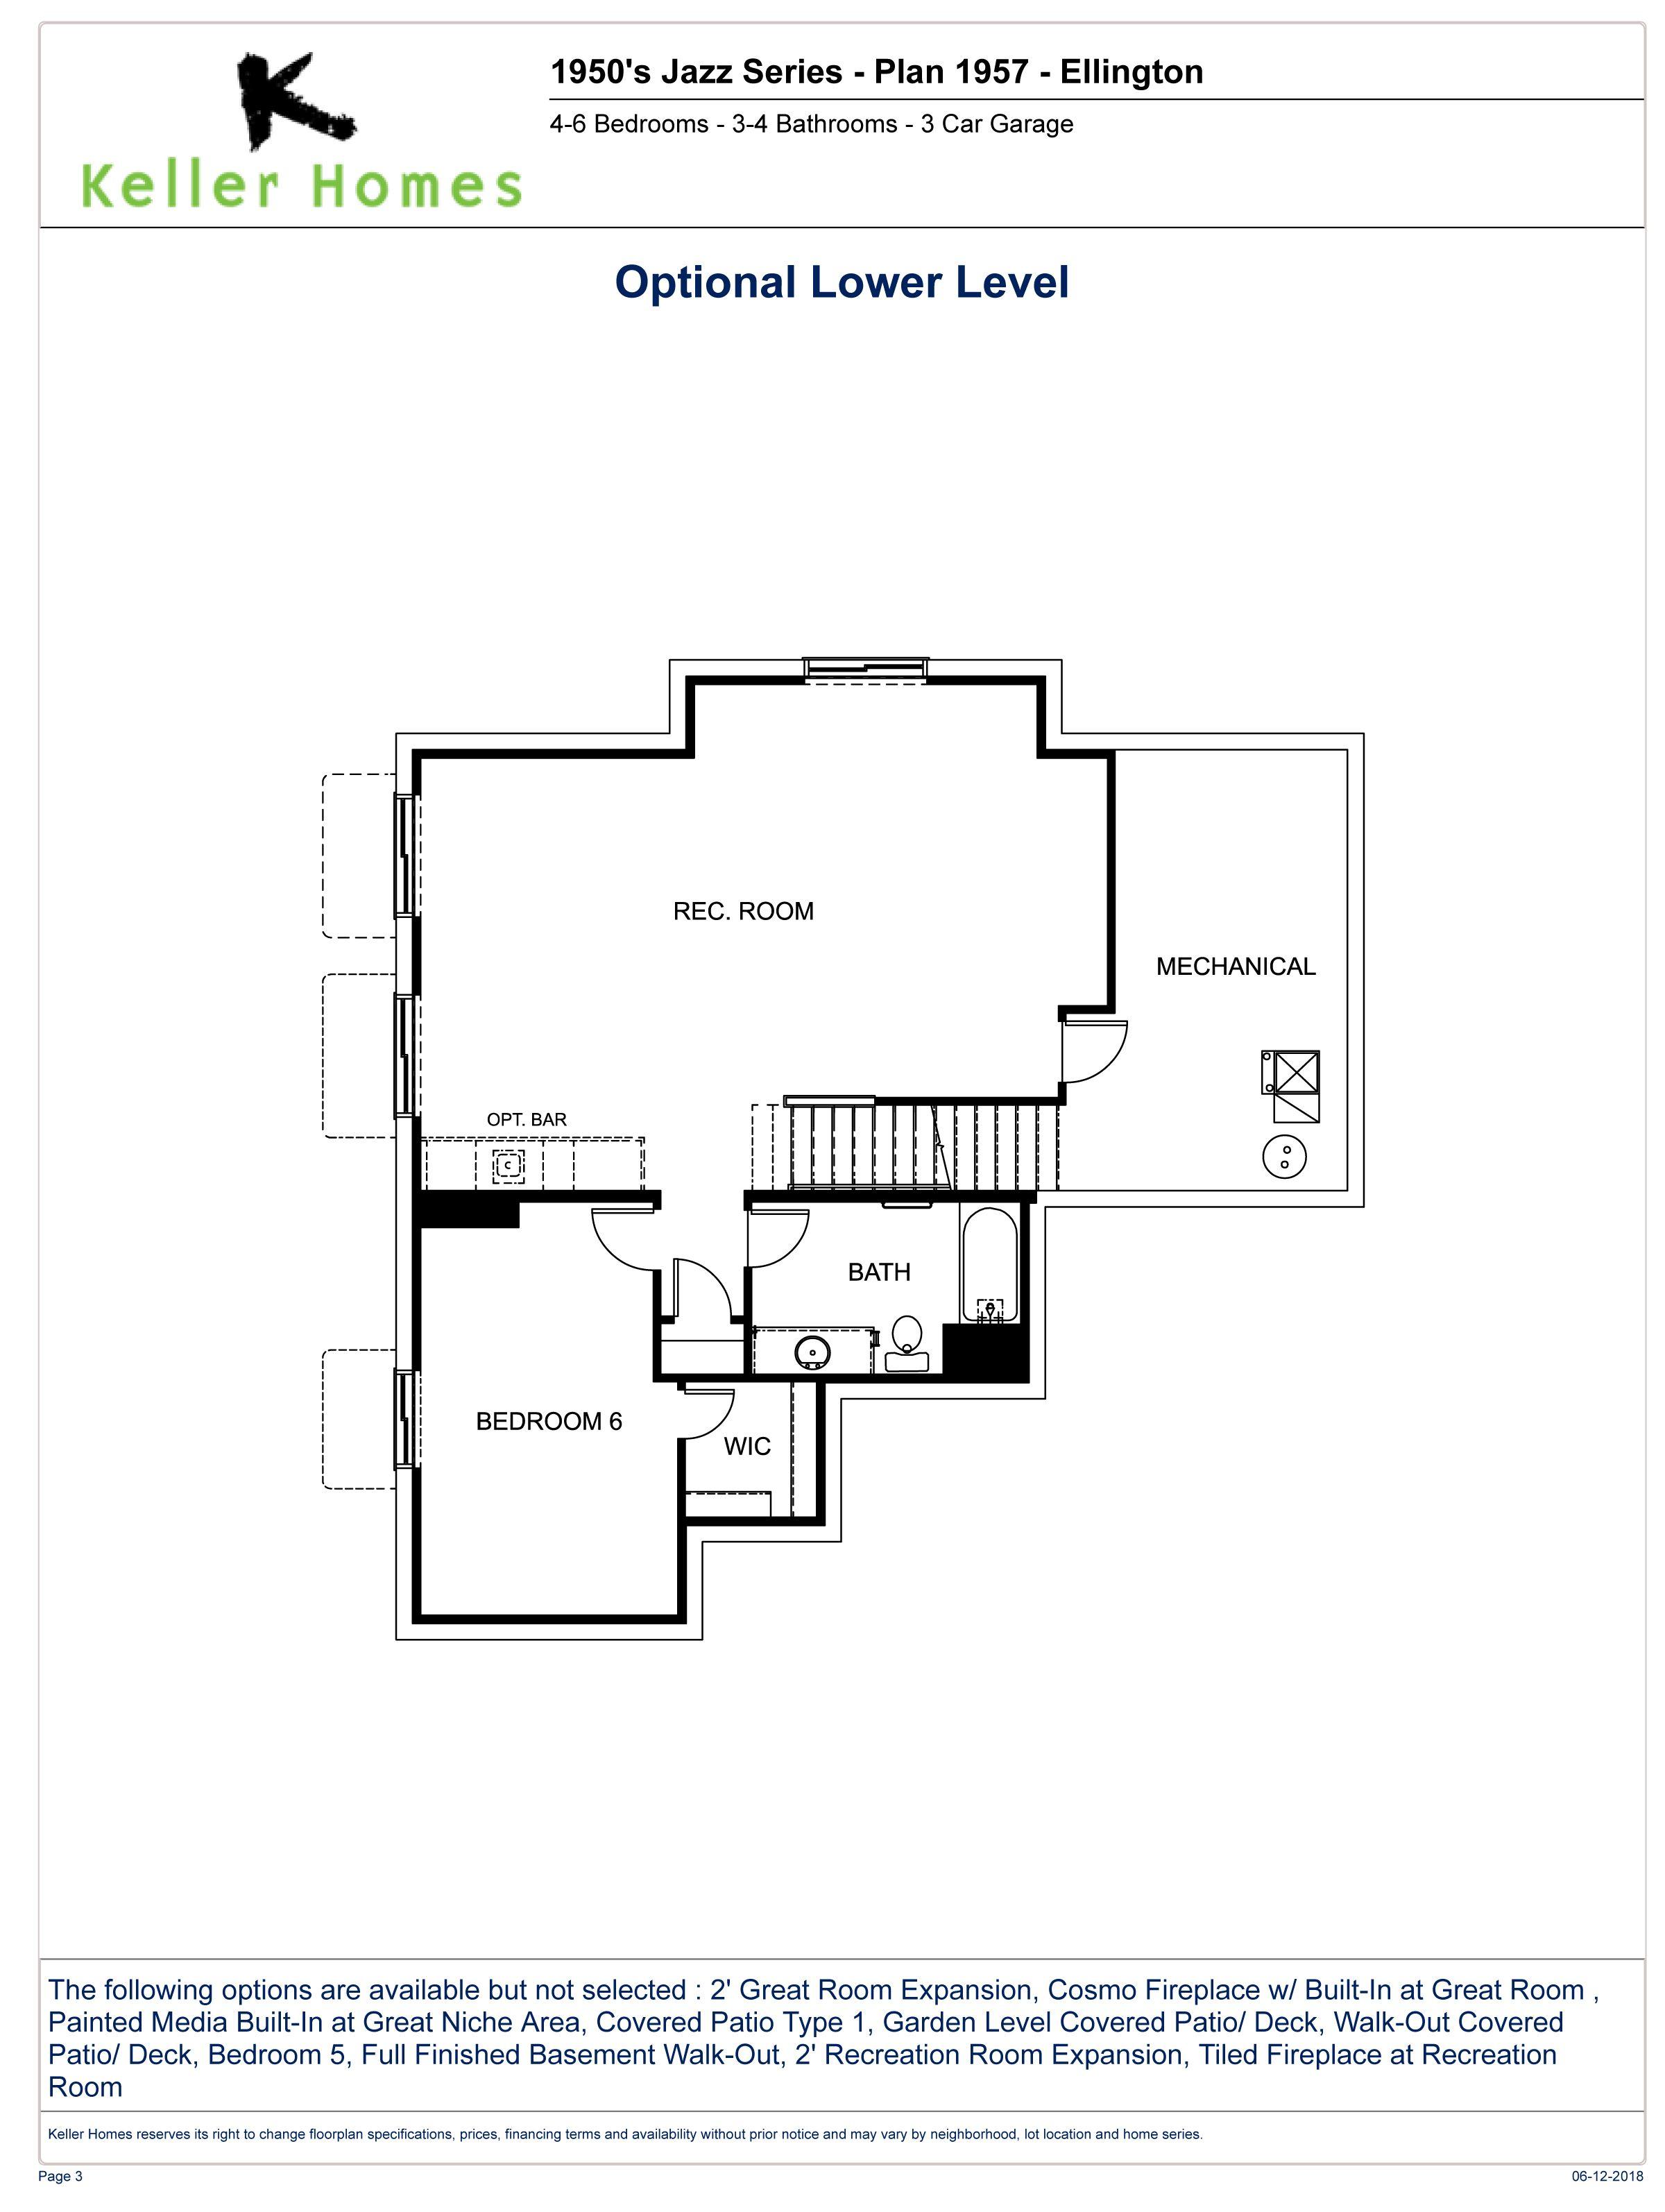 The Ellington Optional Finished Lower Level Floorplan Subject To Change Without Notice Floor Plans Ellington Room Expansion